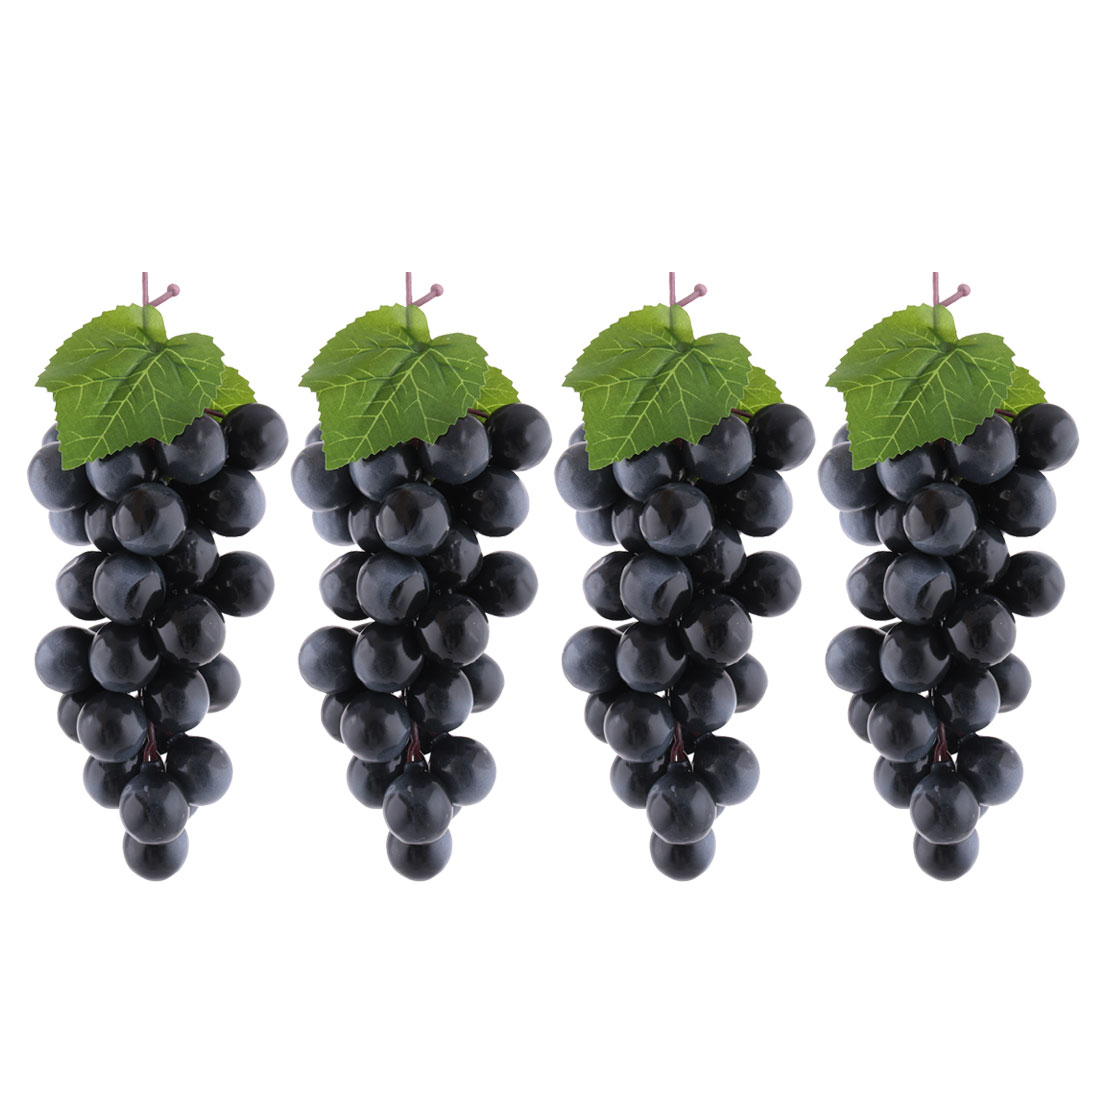 Home Party Ornament Plastic Manmade Simulation Artificial Fruit Grape Black 4pcs